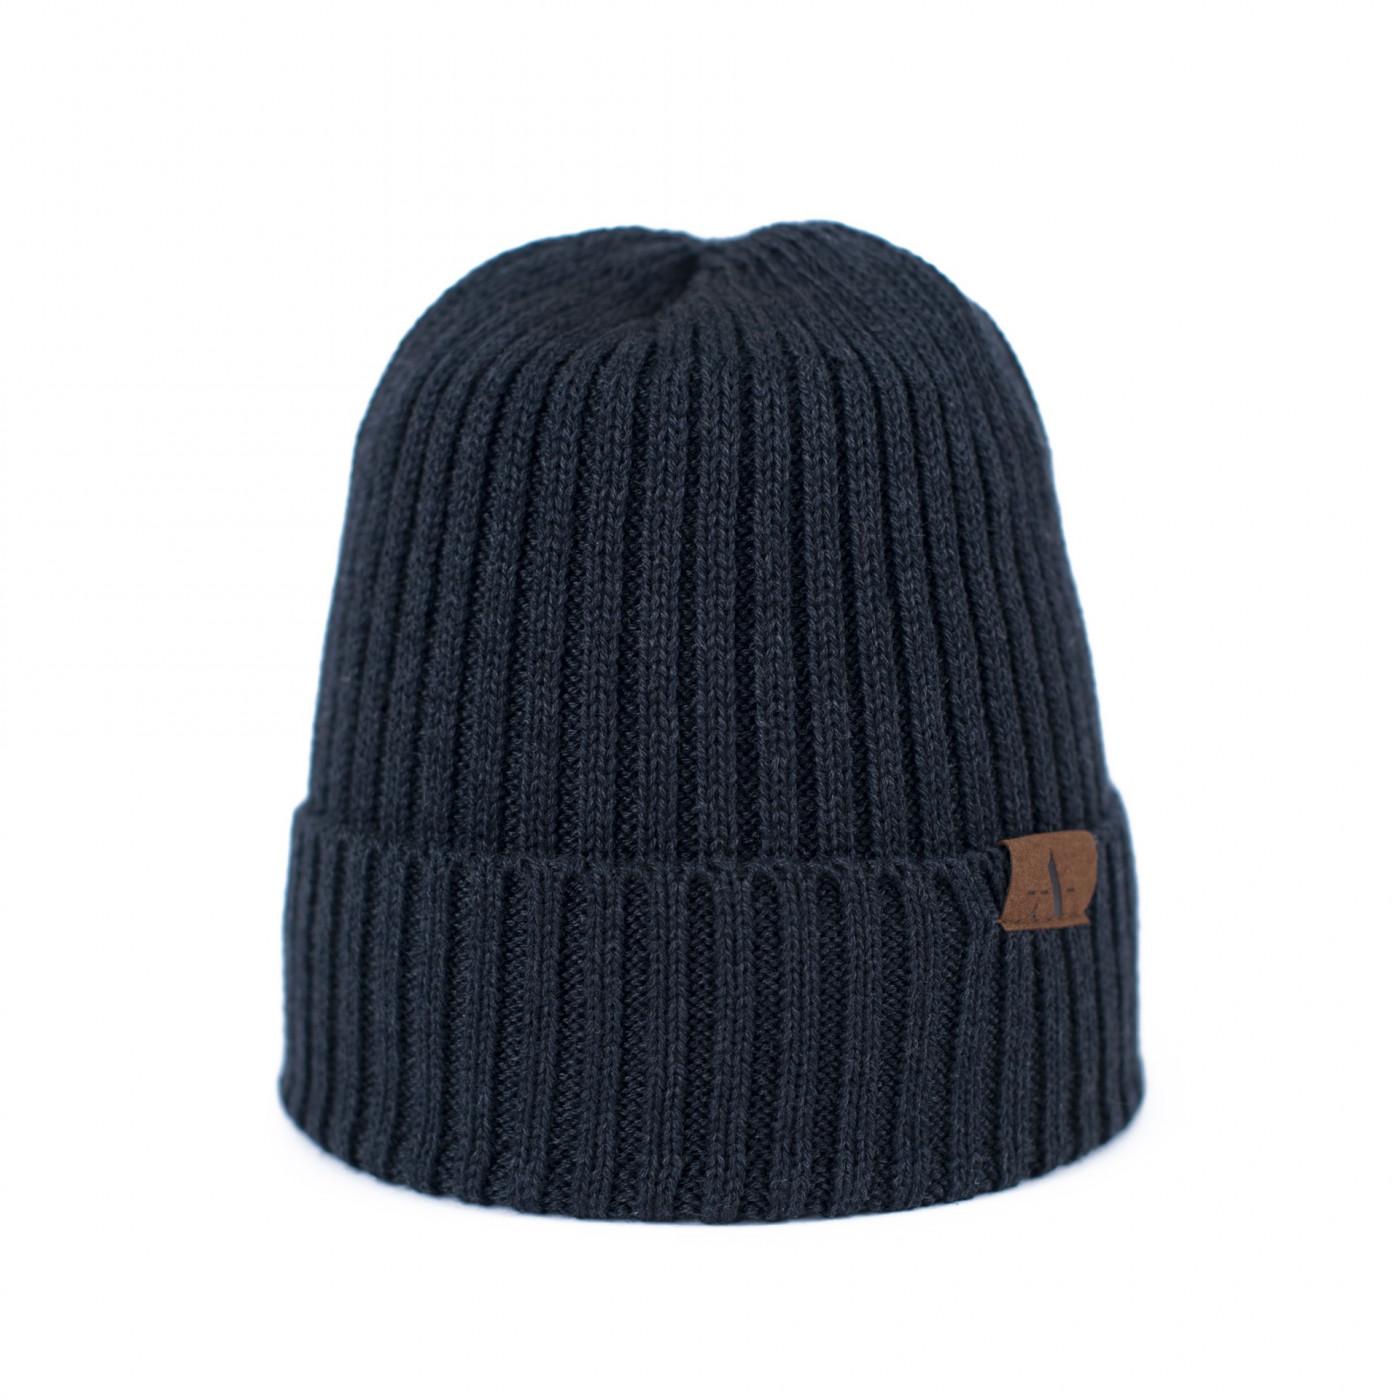 Art Of Polo Unisex's Hat cz19373